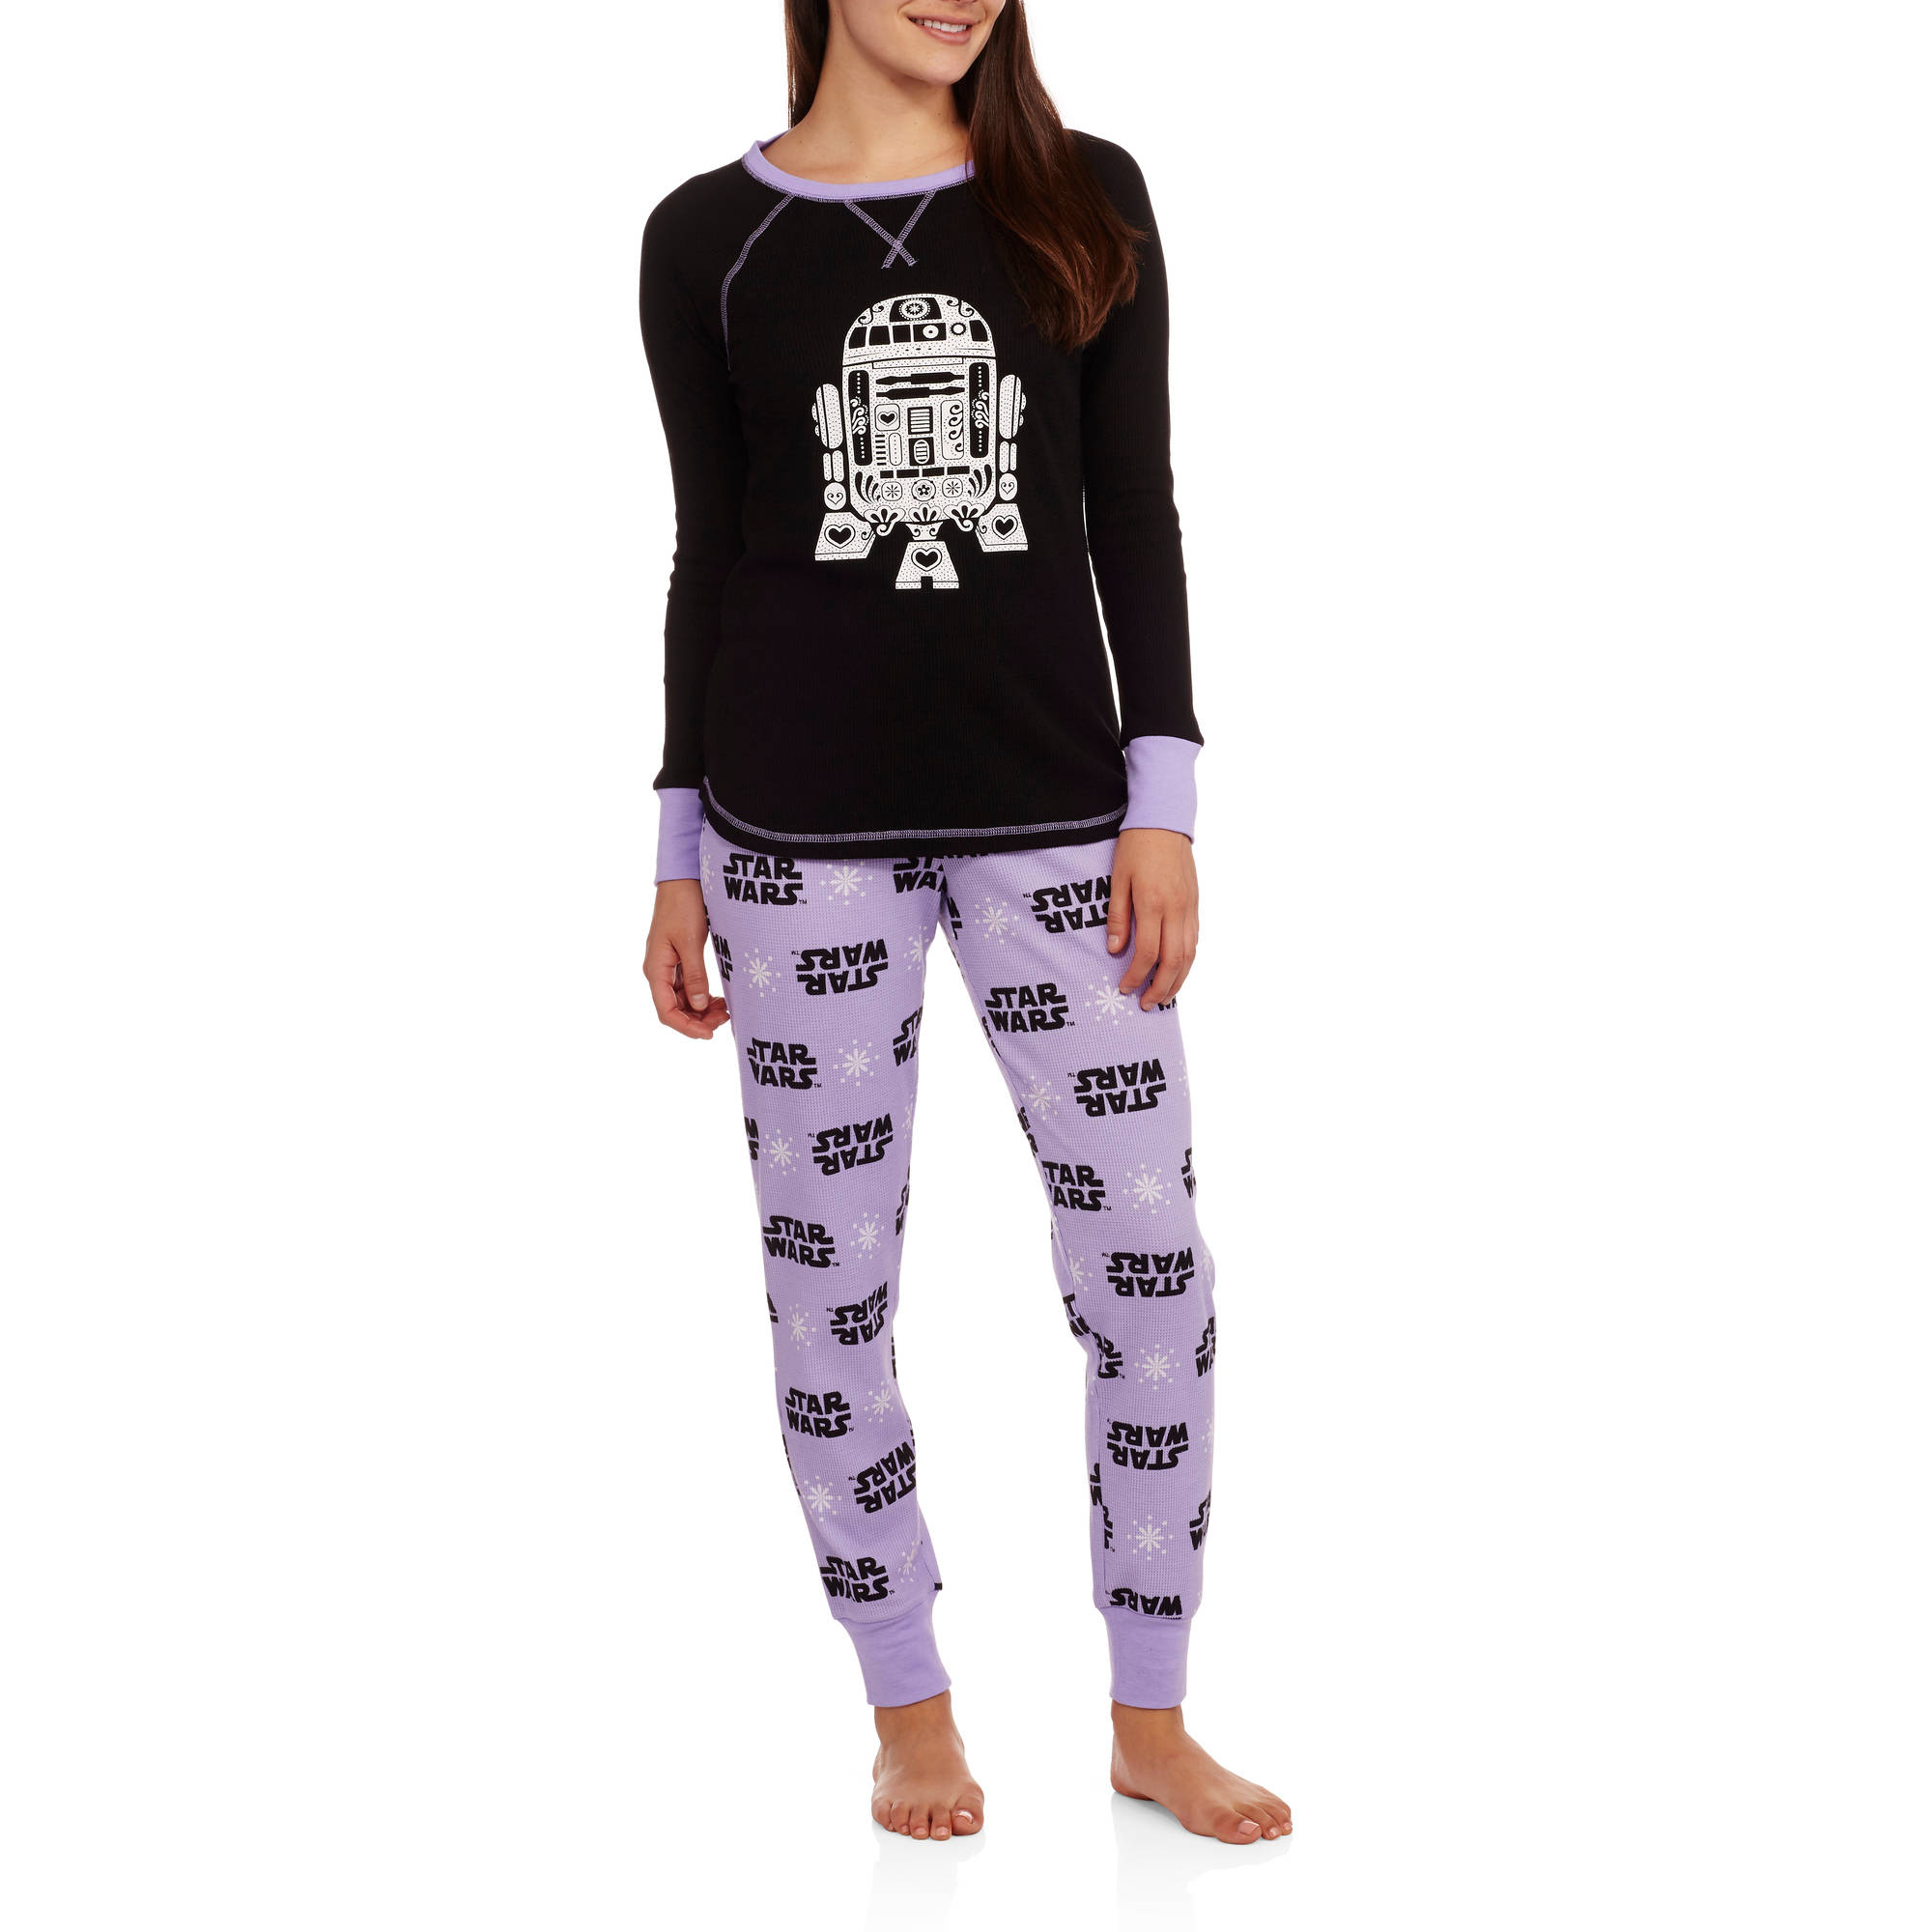 Star Wars Women's License Pajama Thermal Sleep Top and Pant 2 Piece Sleepwear Set